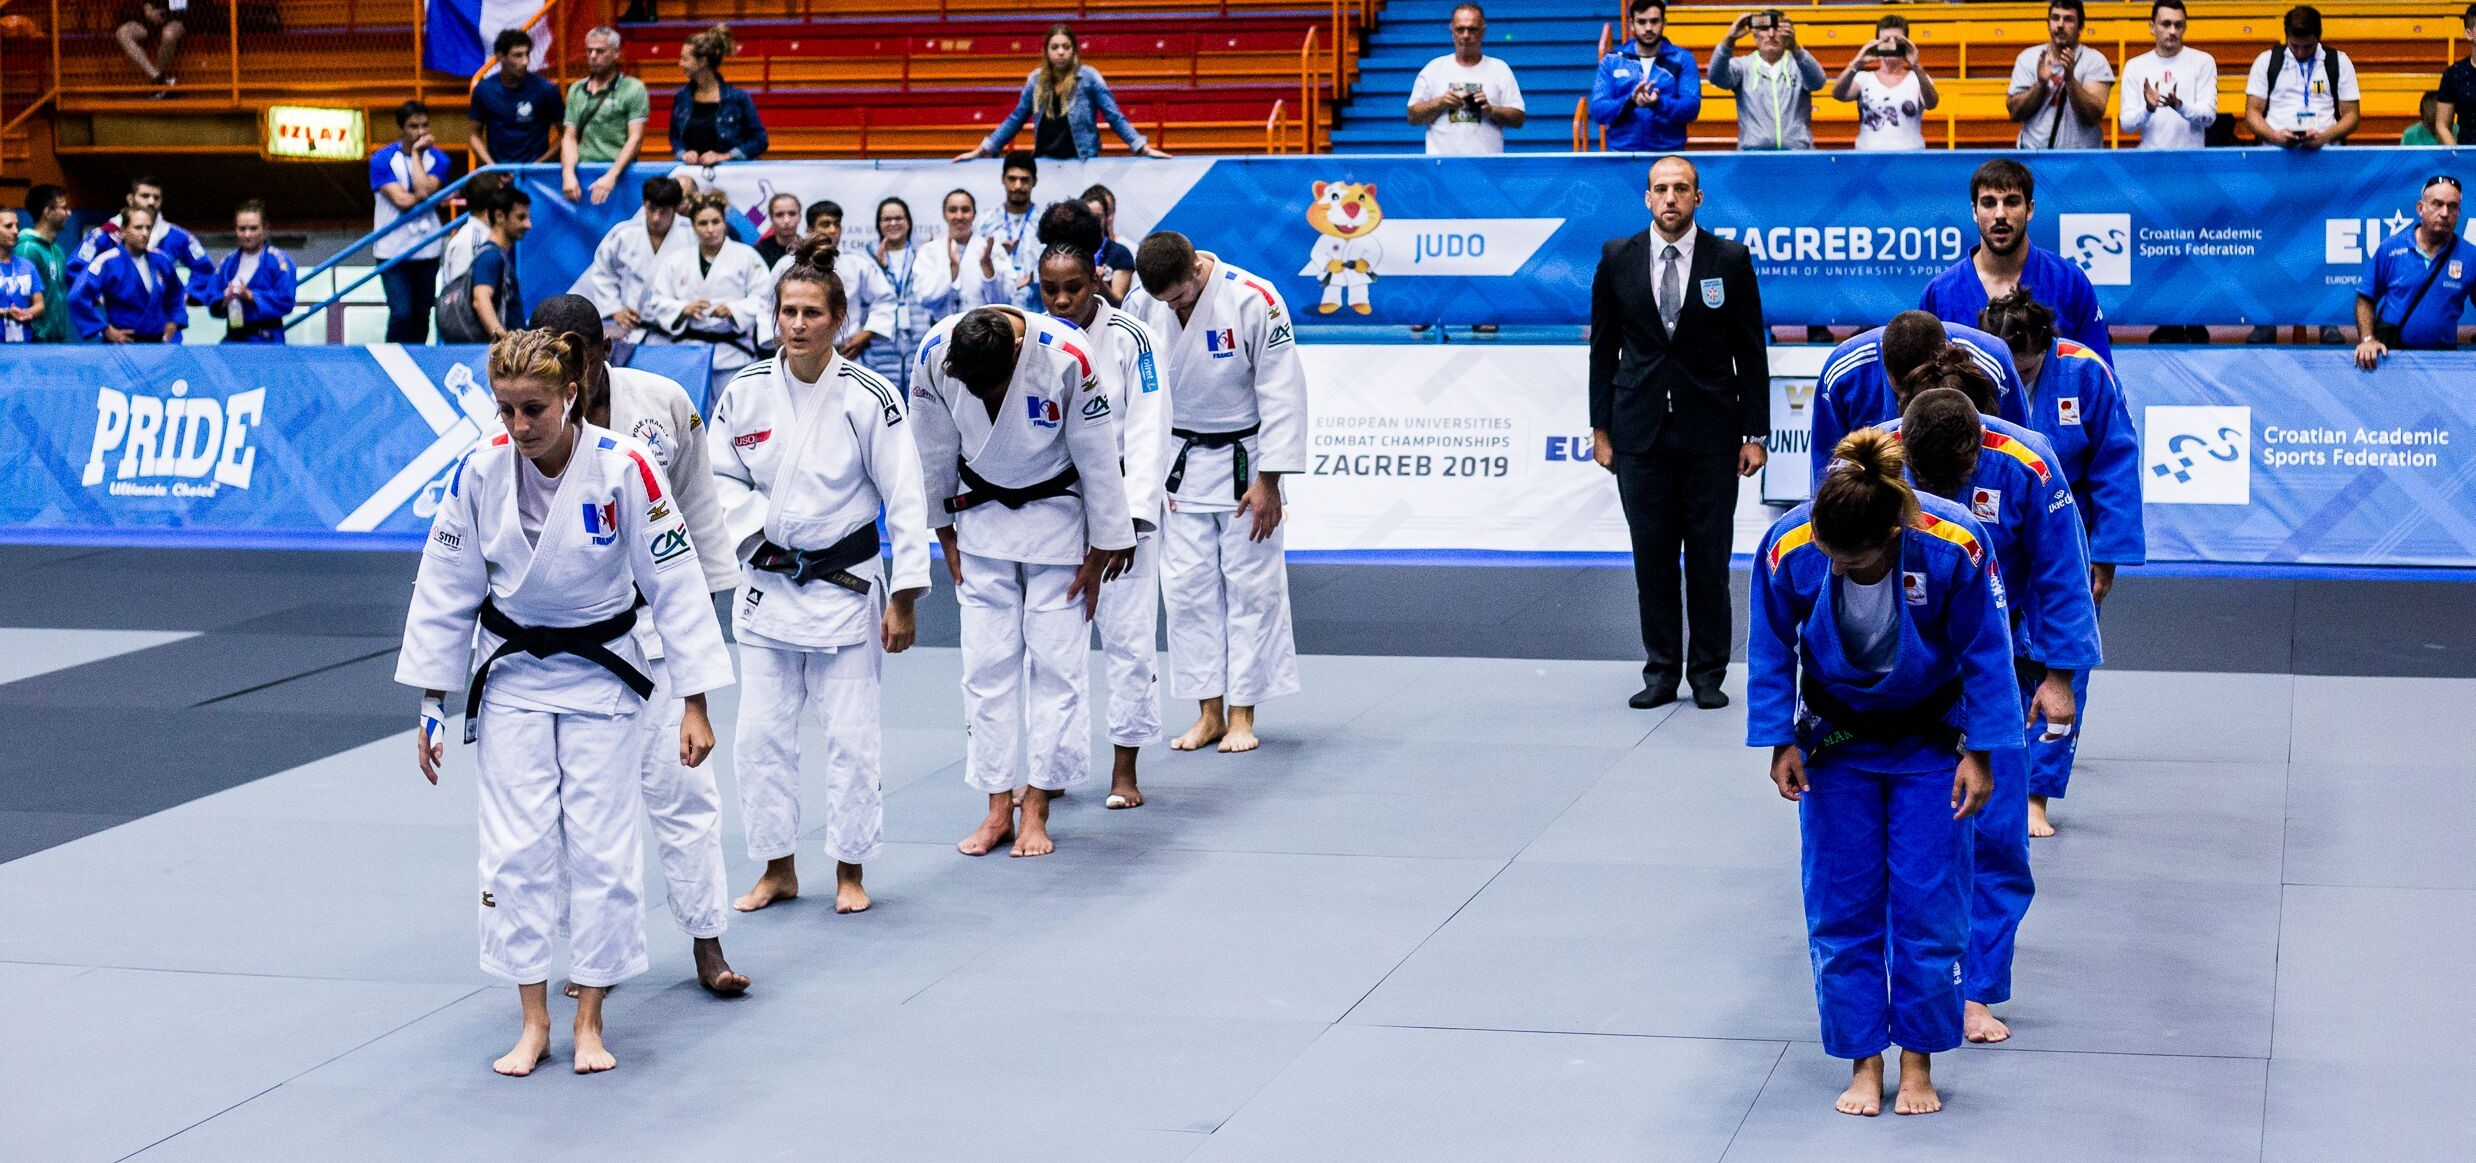 European Universities Judo Championship Eusa